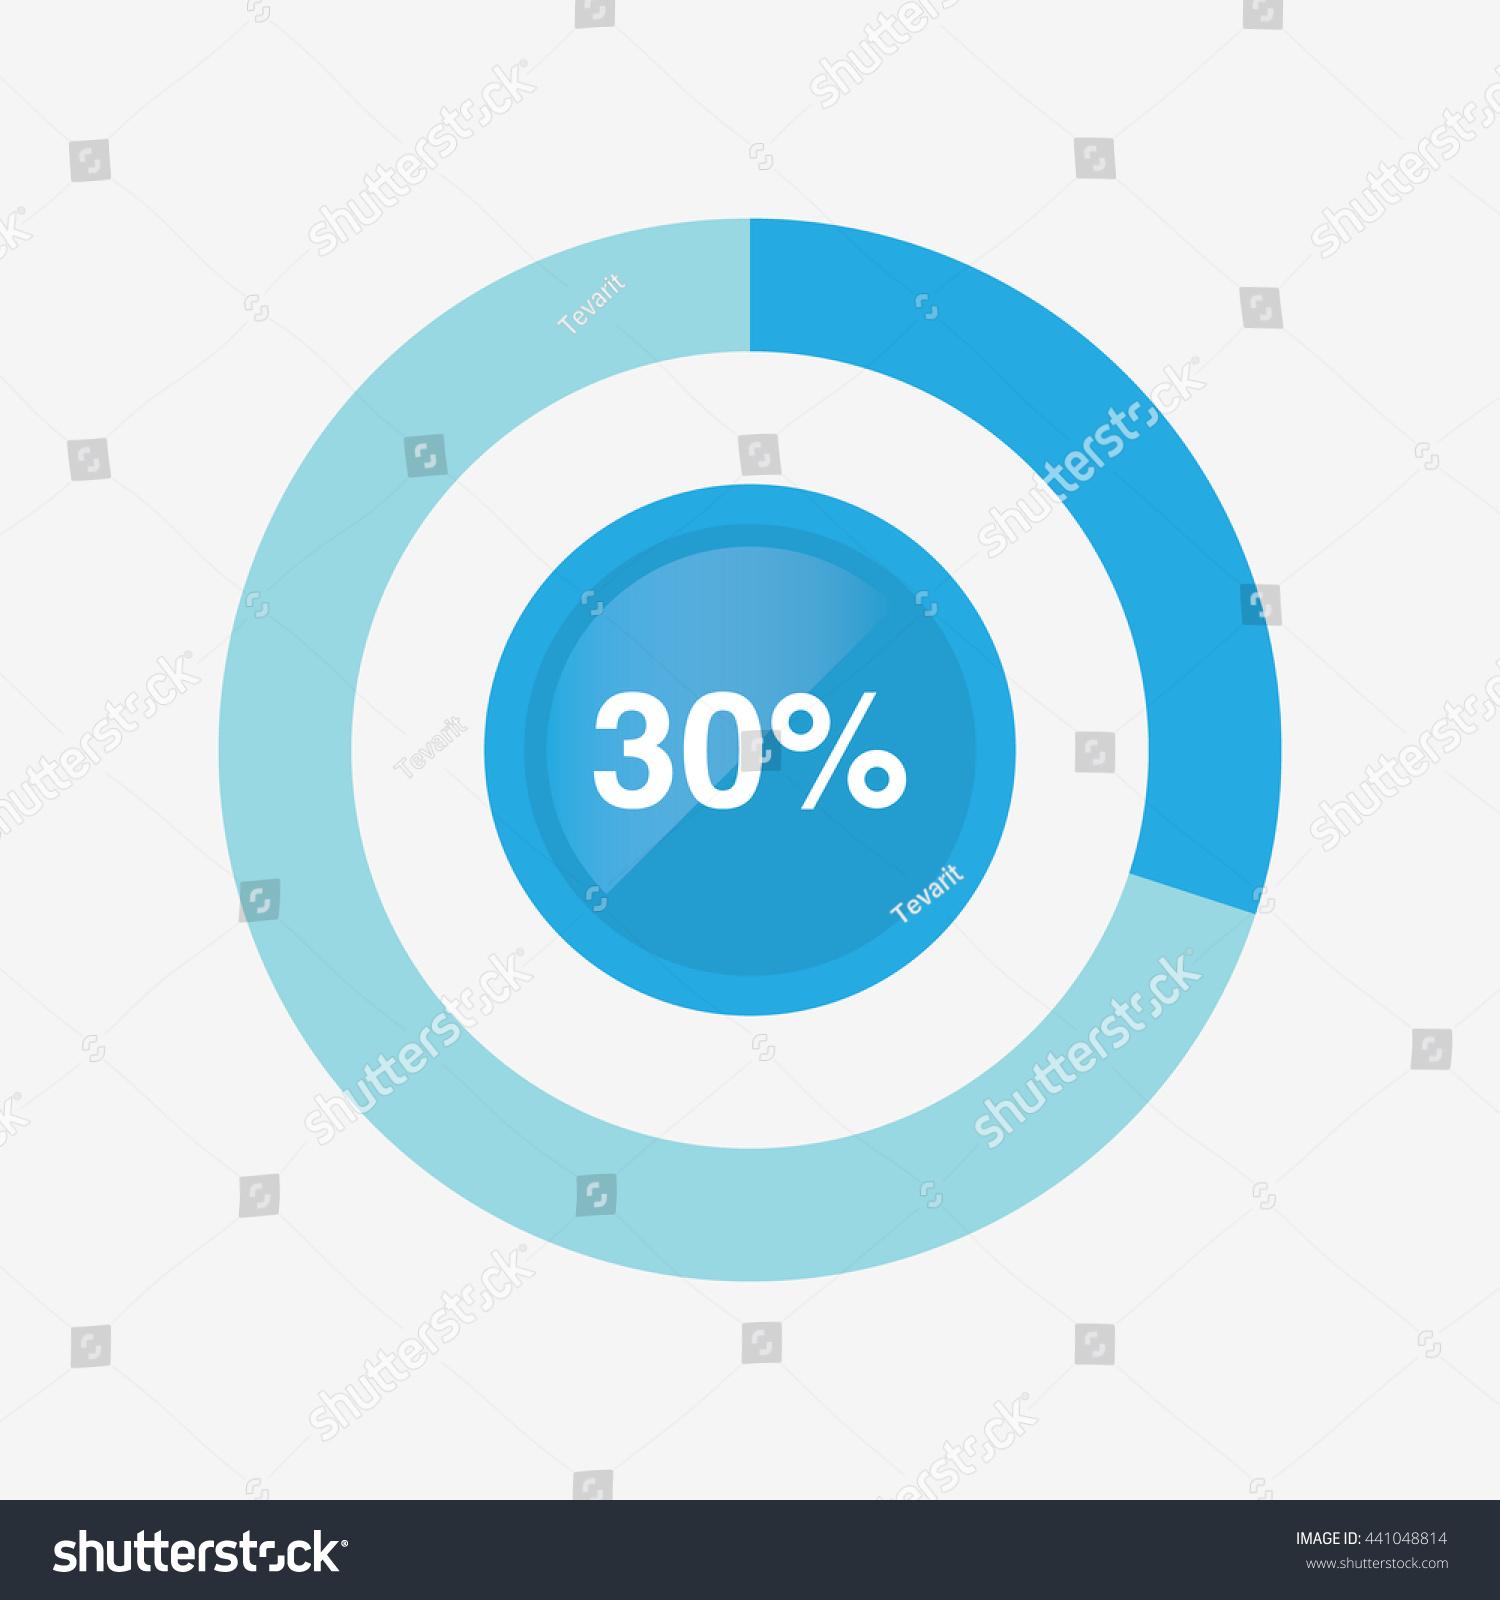 Icon pie blue chart 30 percent stock vector 441048814 shutterstock icon pie blue chart 30 percent pie chart vector nvjuhfo Choice Image